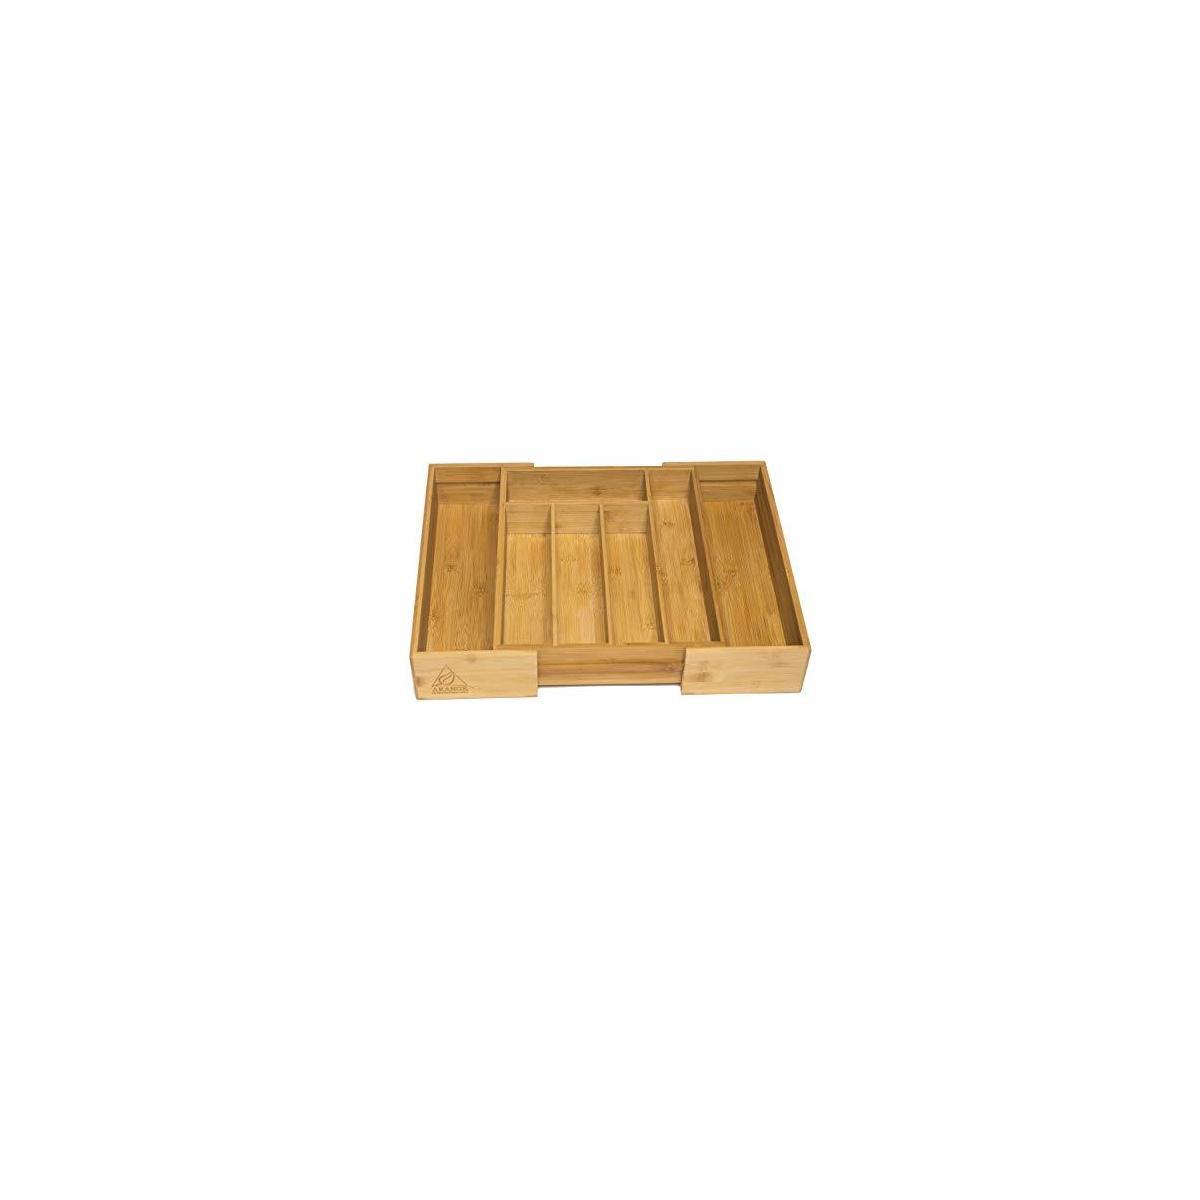 7 slot Adjustable  Bamboo Wood Cutlery Tray Drawer Utensil Organizer for silverware